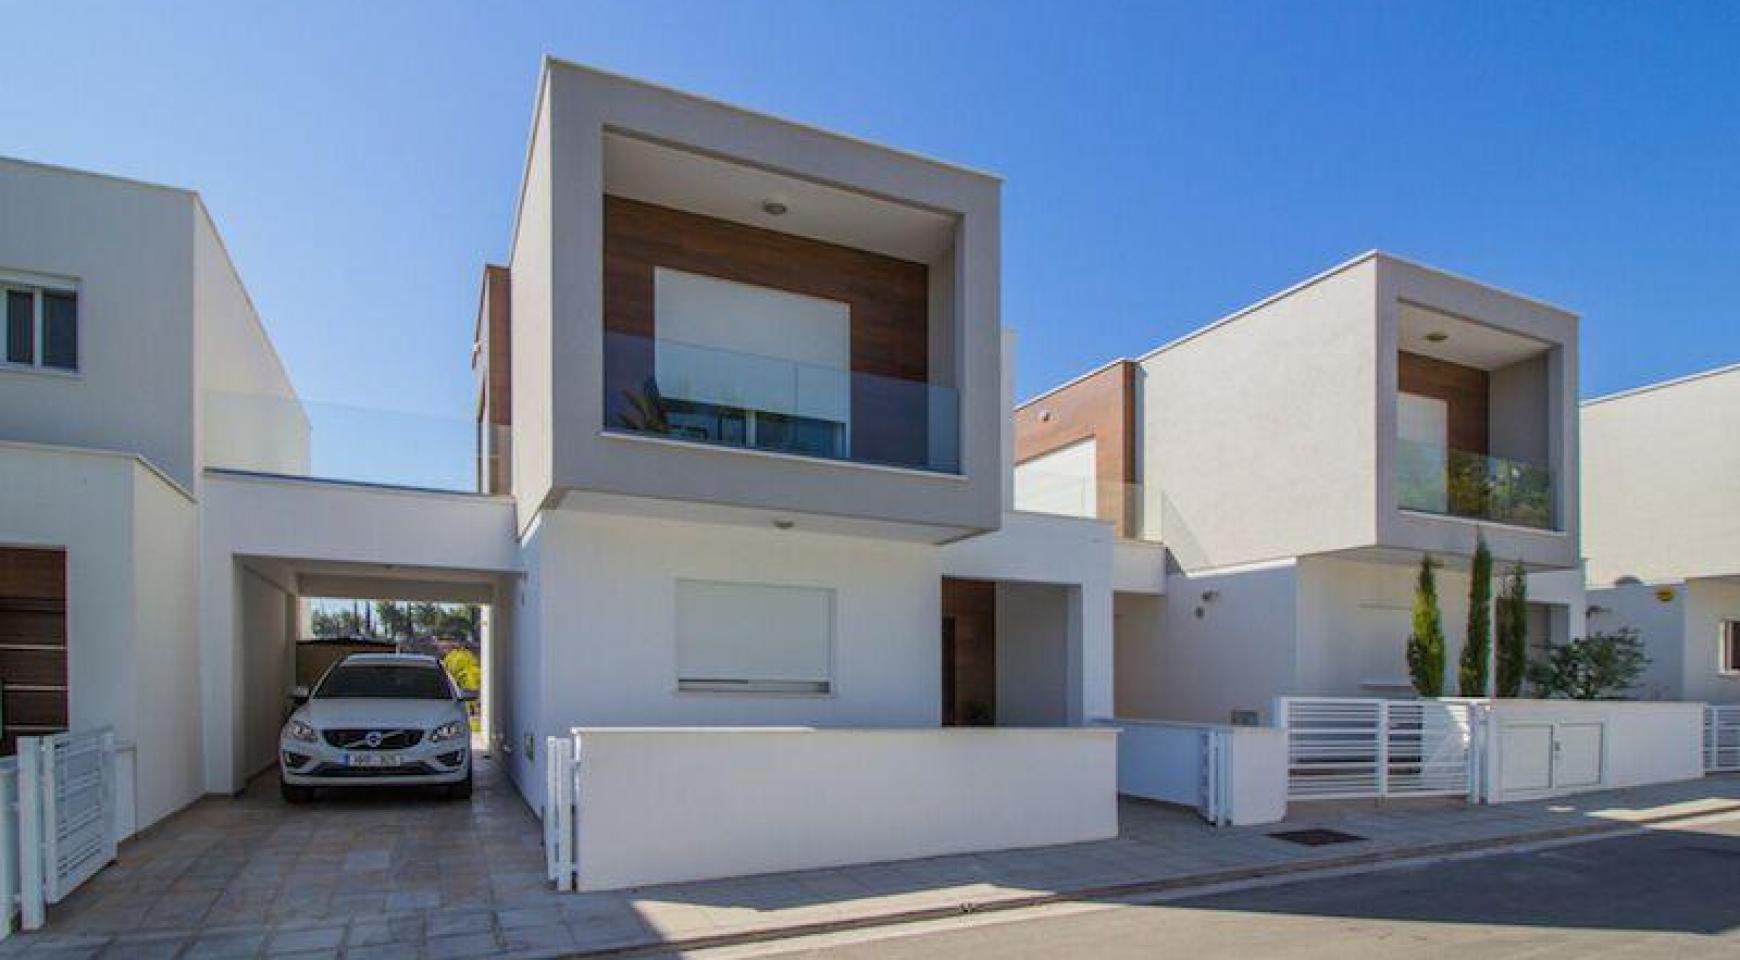 3 Bedroom Villa in Ipsonas Area - 1